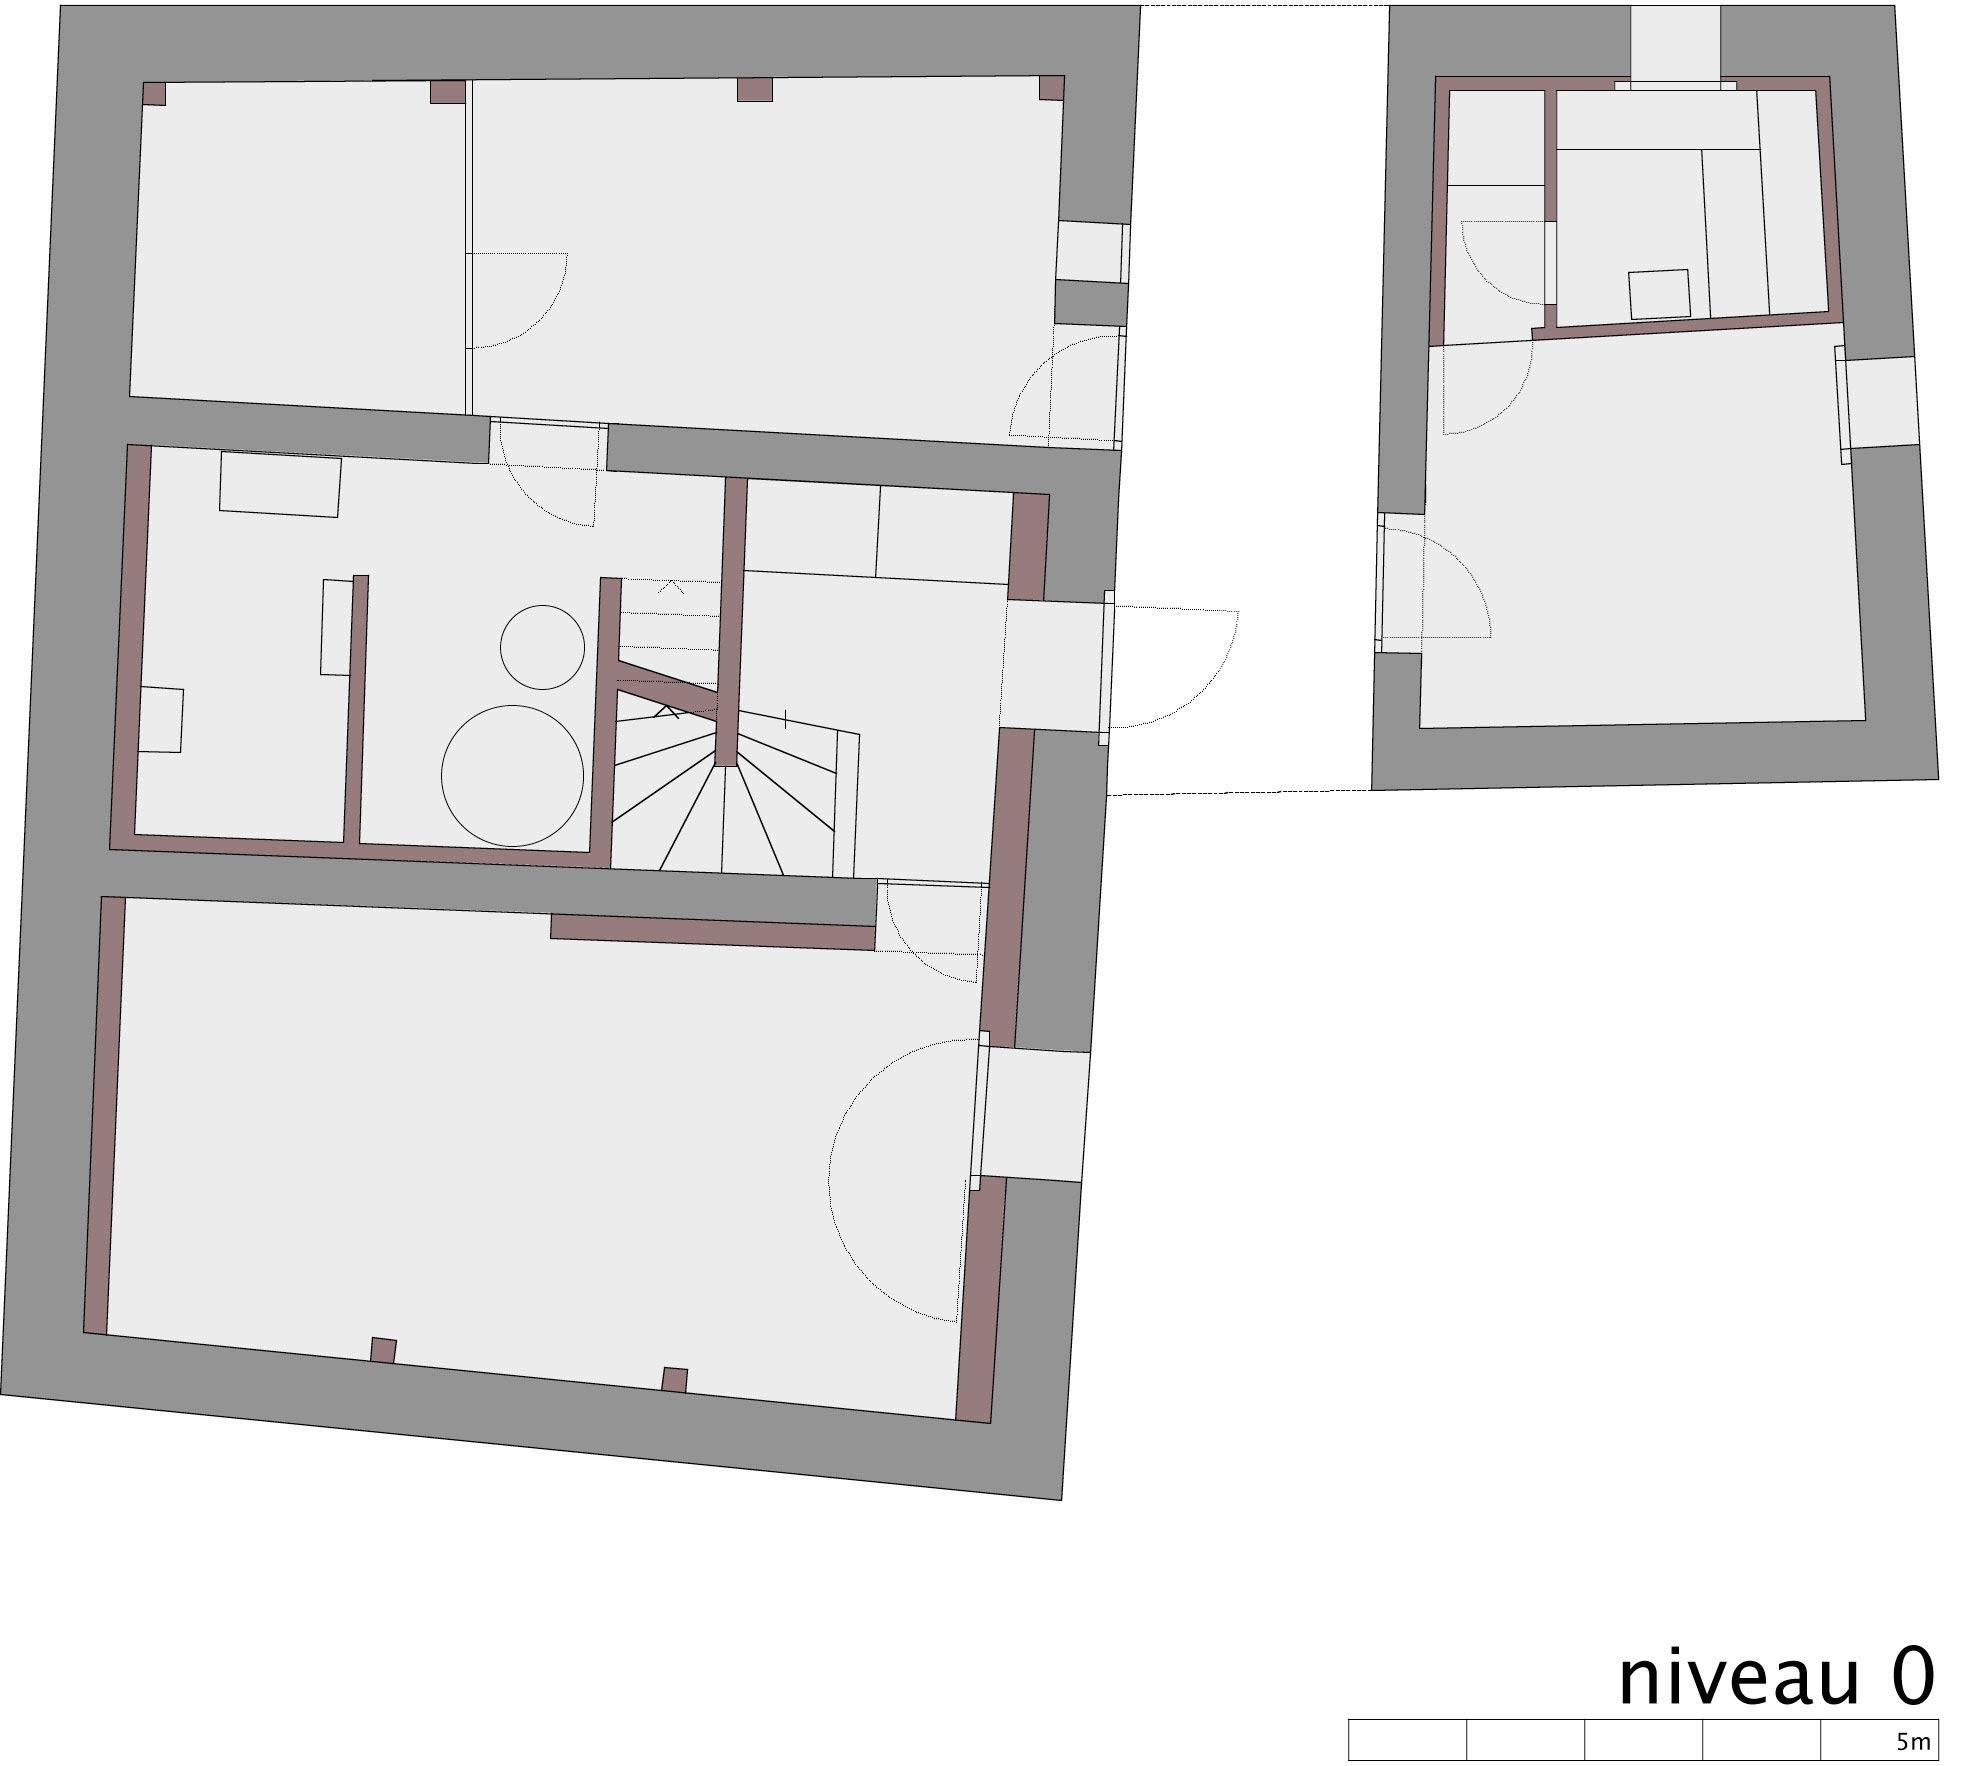 Ground Floor Plan, Renovation in Chamoson, Switzerland by Savioz Fabrizzi Architecte